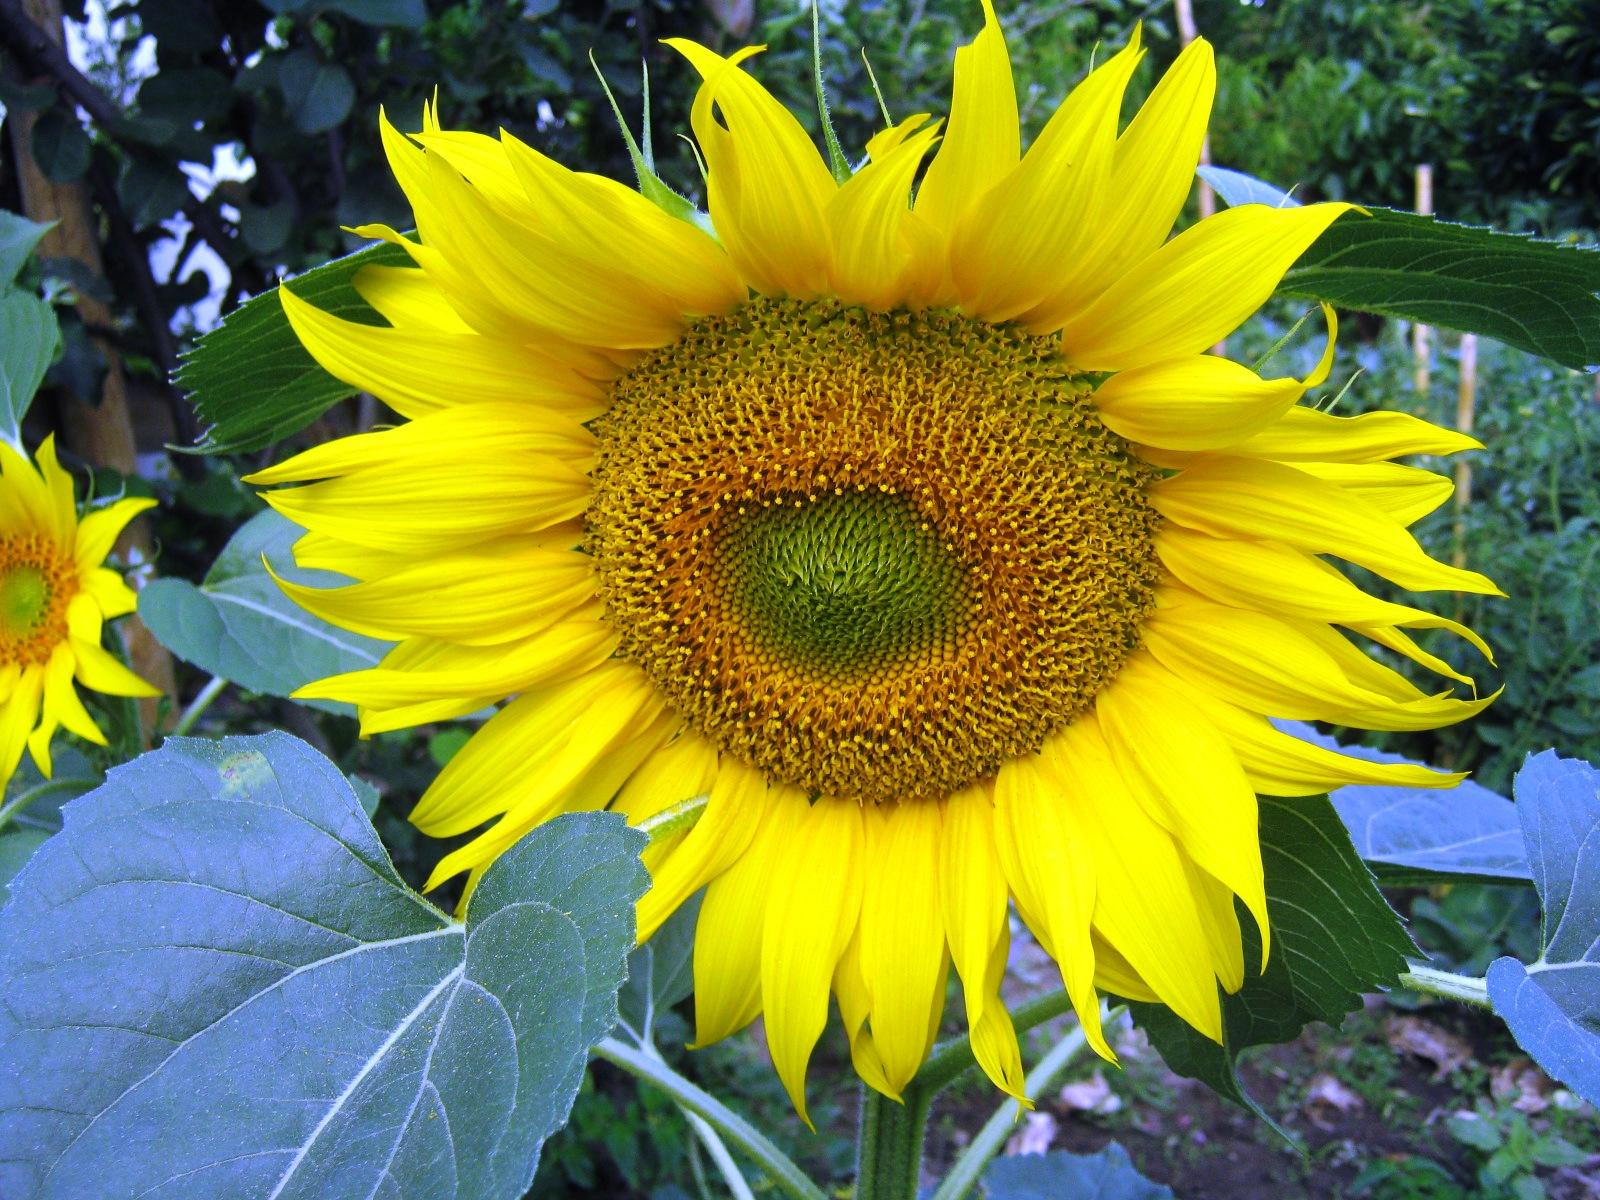 meu quintal meu jardim : MEUS CAMINHOS RIBATEJO: FOTOS RIBATEJO, MINHA CASINHA, MEU ...